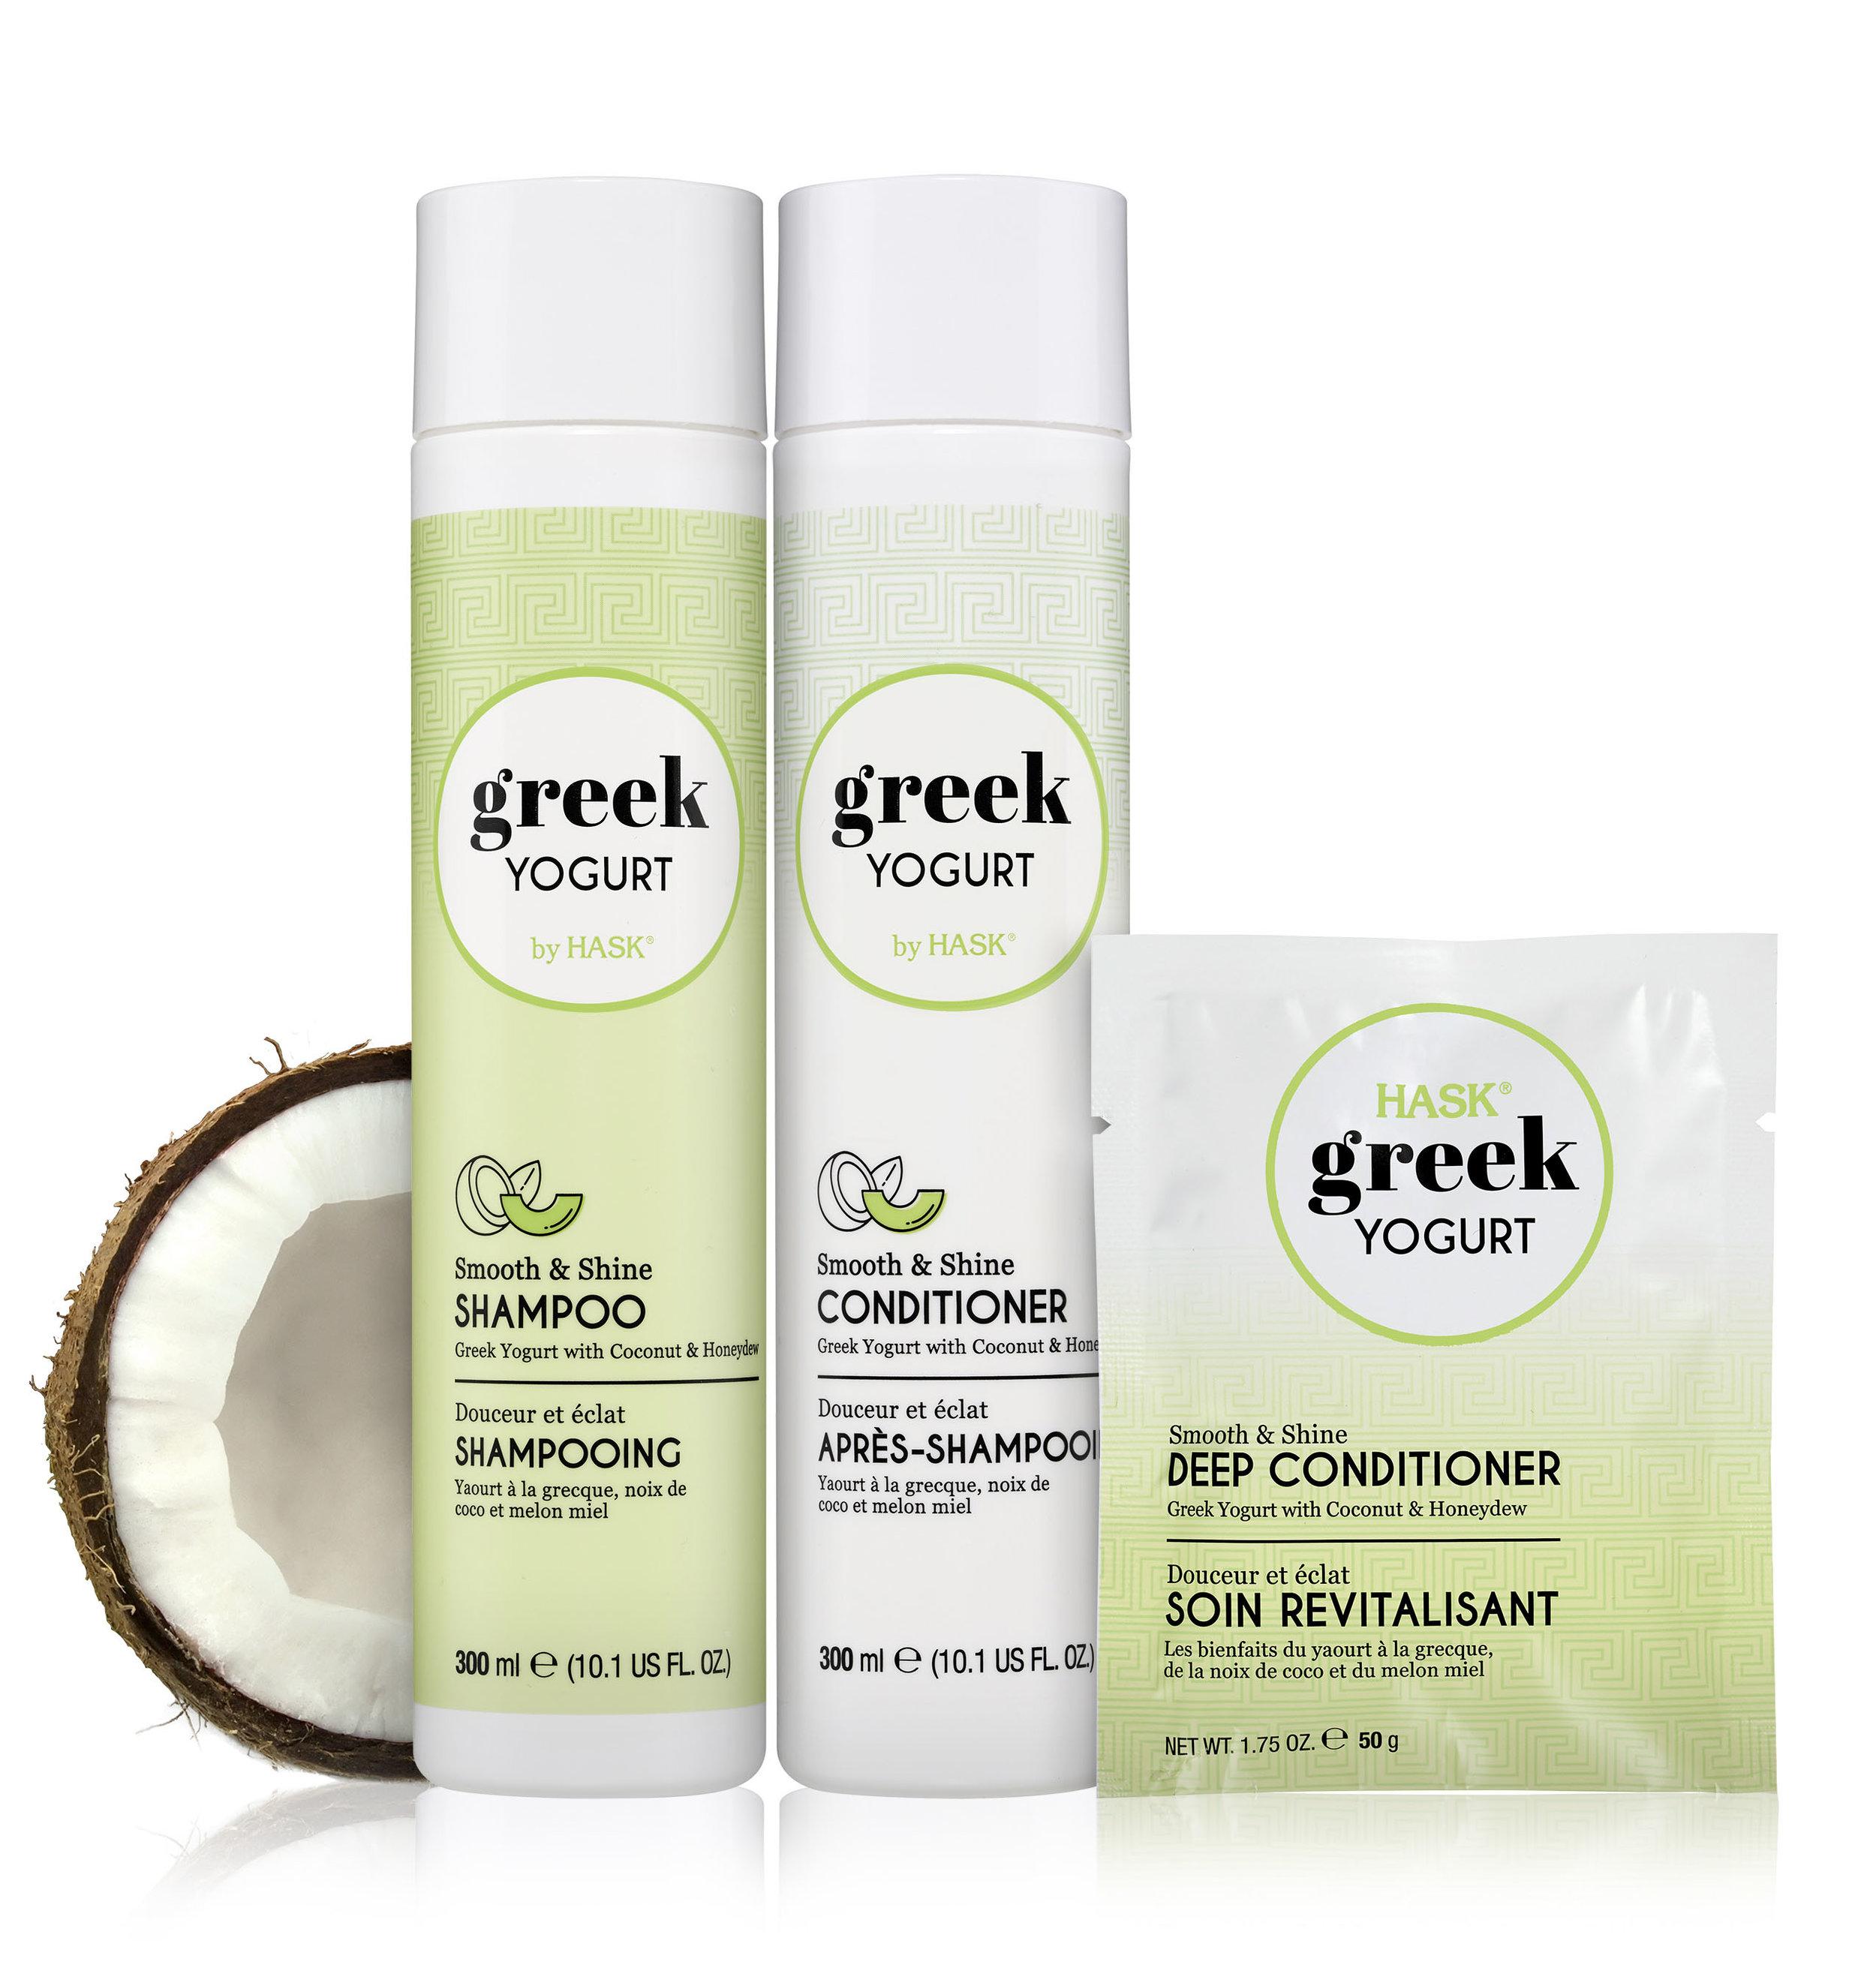 Greek_Yogurt_SS_Coconut_Honeydew_lineup_v2_low.jpg